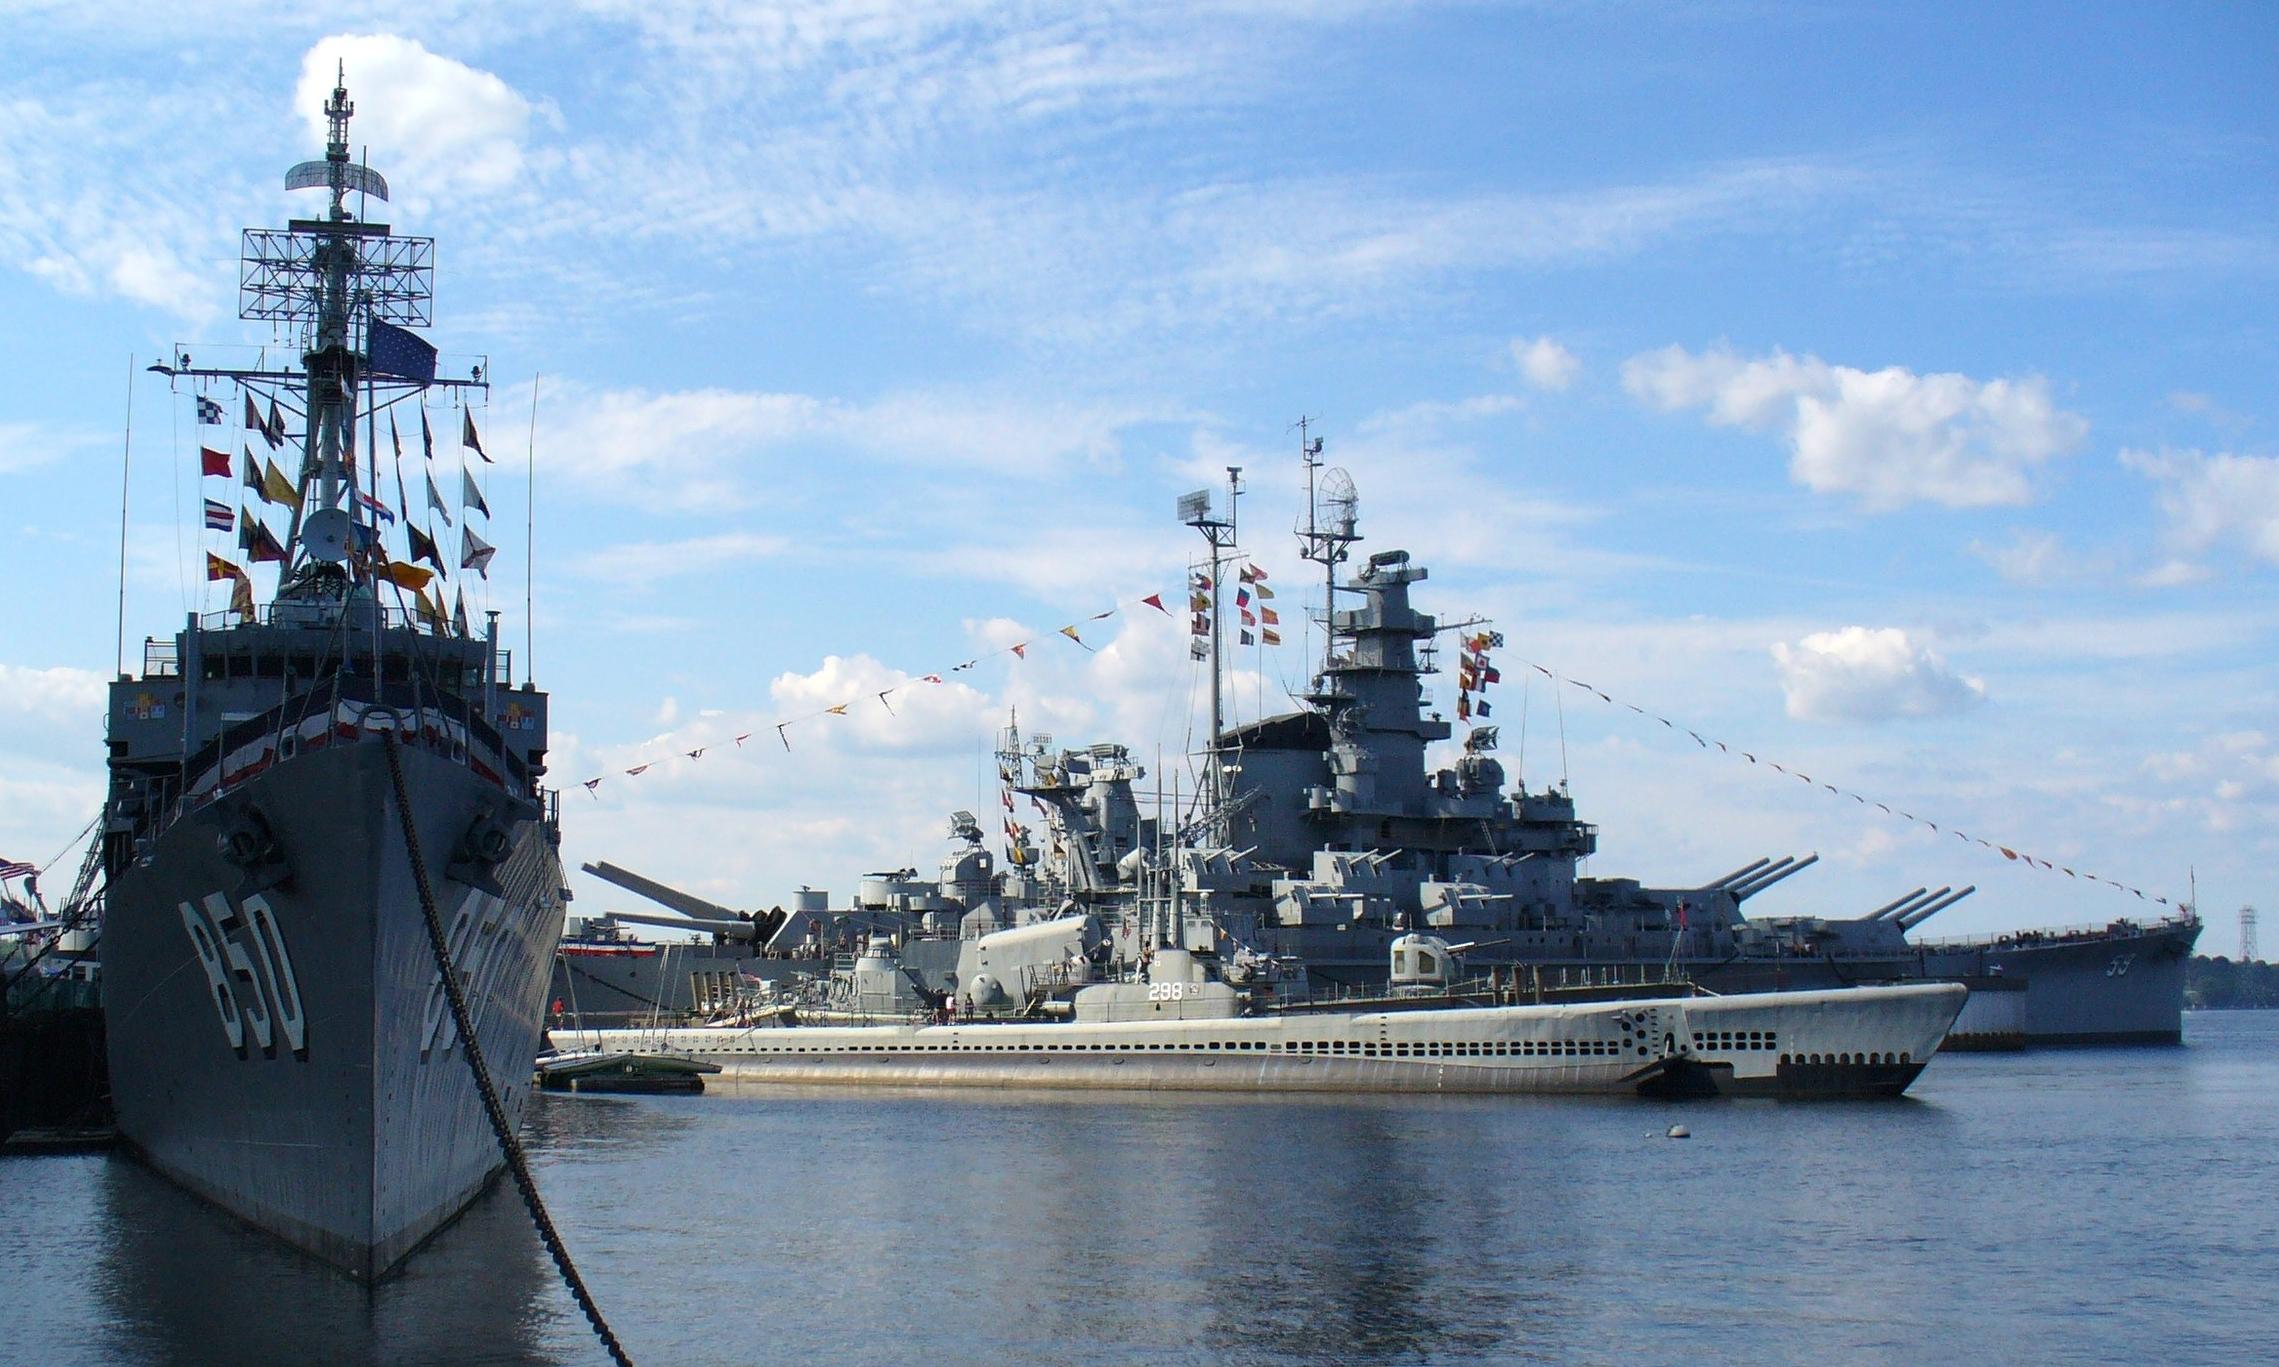 Battleship_Cove.JPG